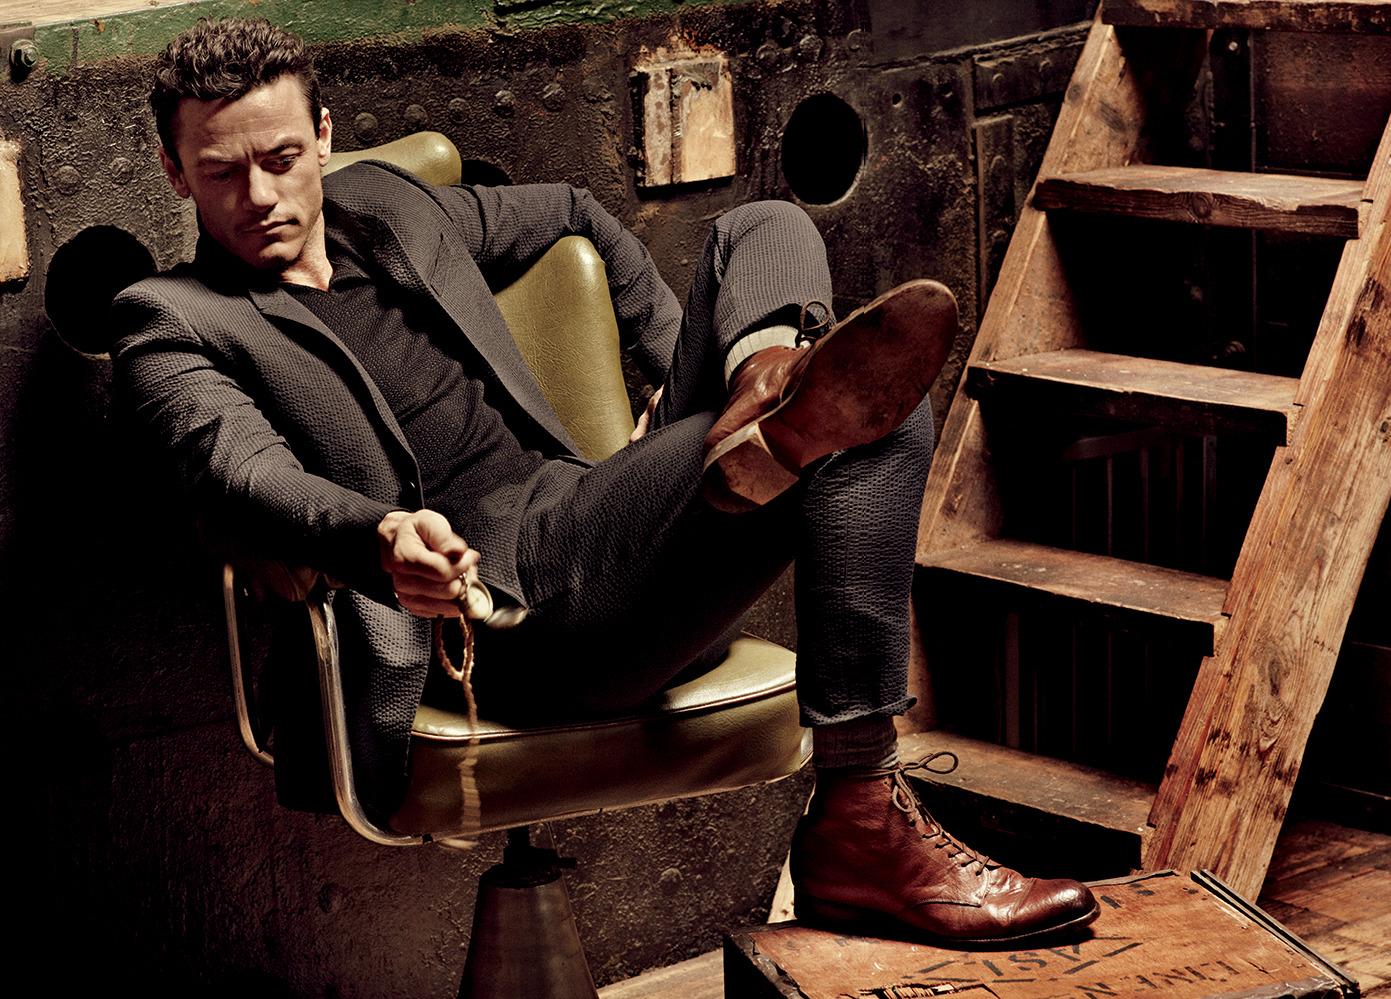 Seersucker jacket and pants Burberry Prorsum, Cotton t-shirt Giorgio Armani, Cashmere socks Falke Calf, boots Esquivel Shoes